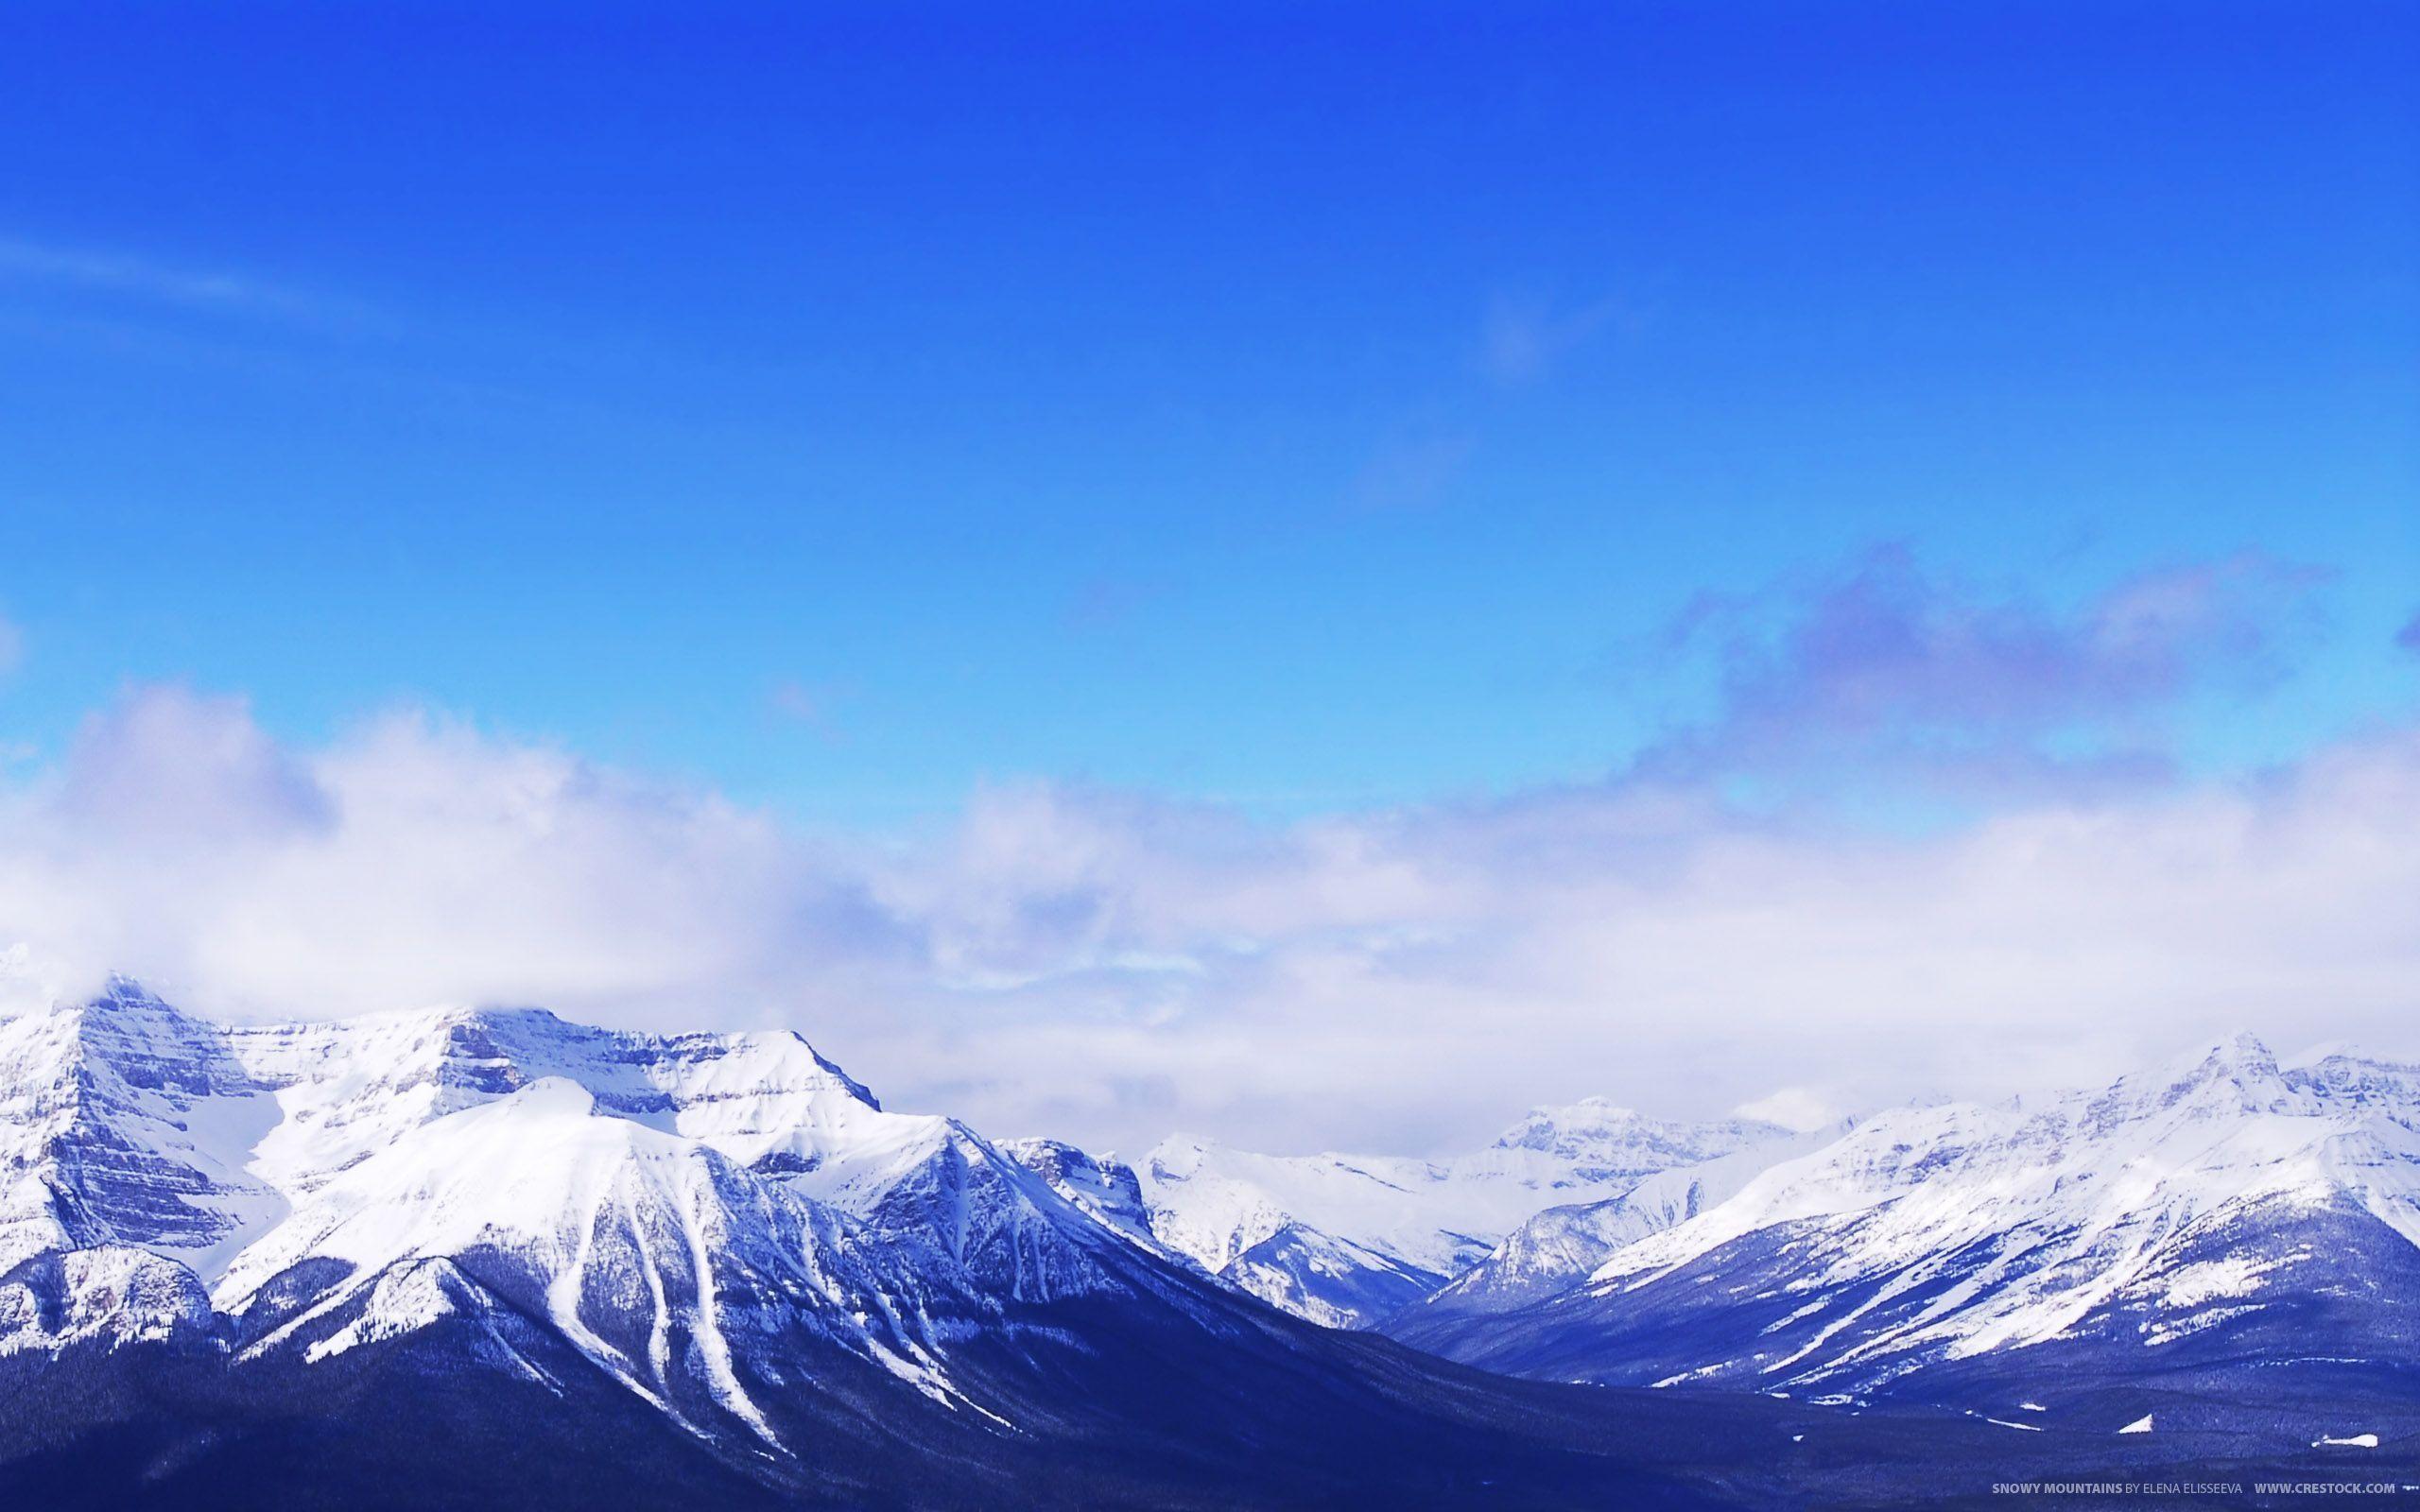 Beautiful Snowy Mountain Wallpaper HD – dlwallhd.com